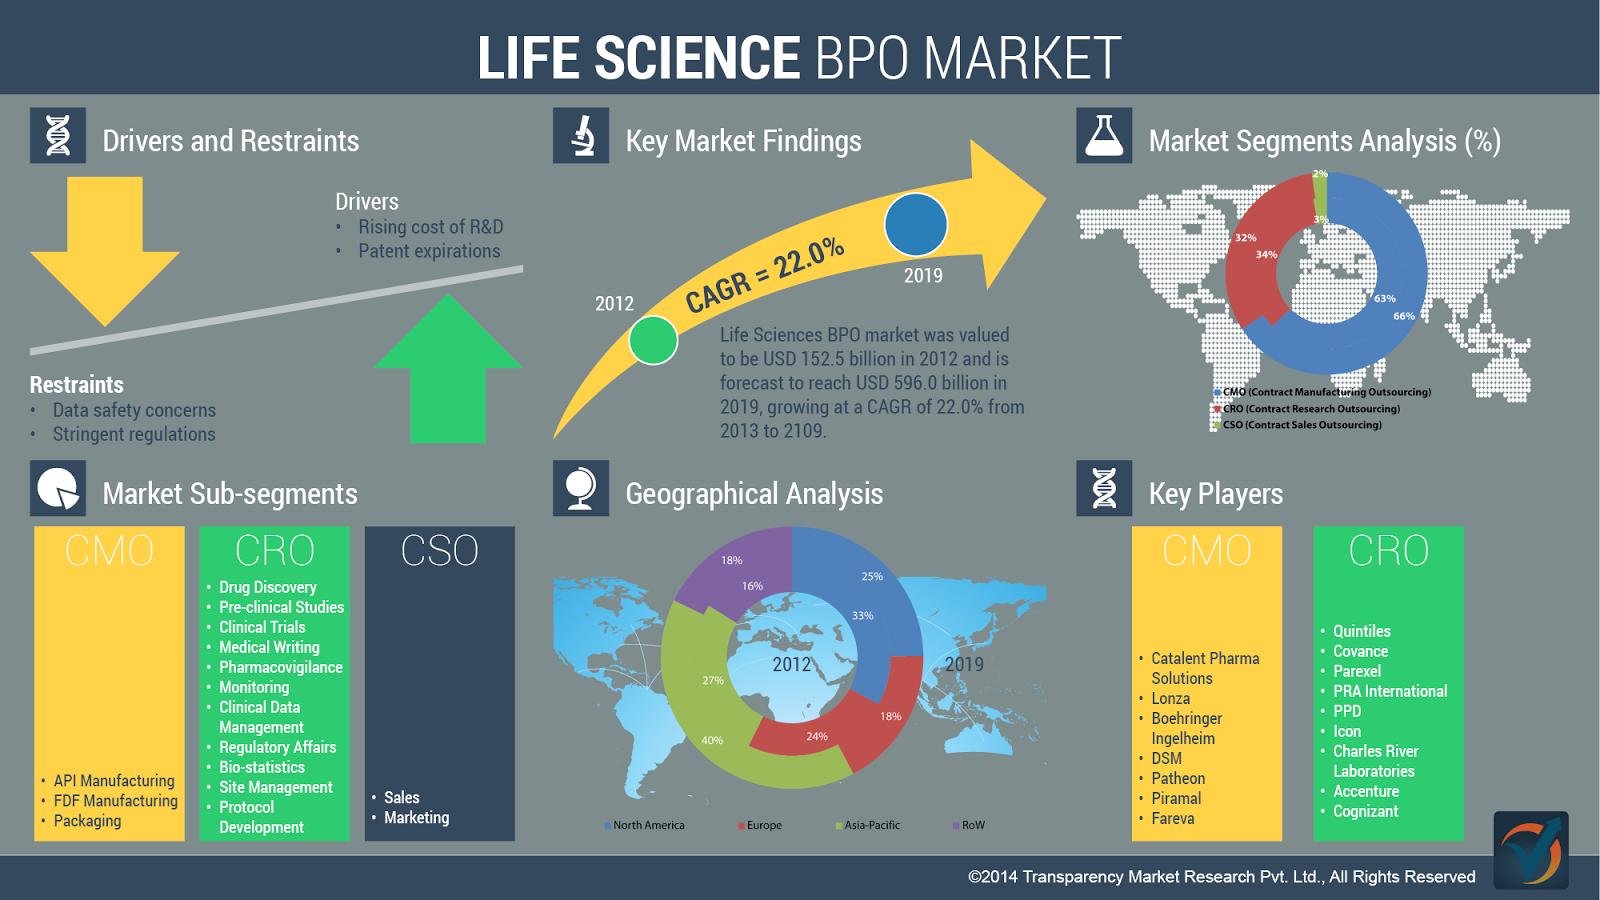 Life Sciences BPO Market